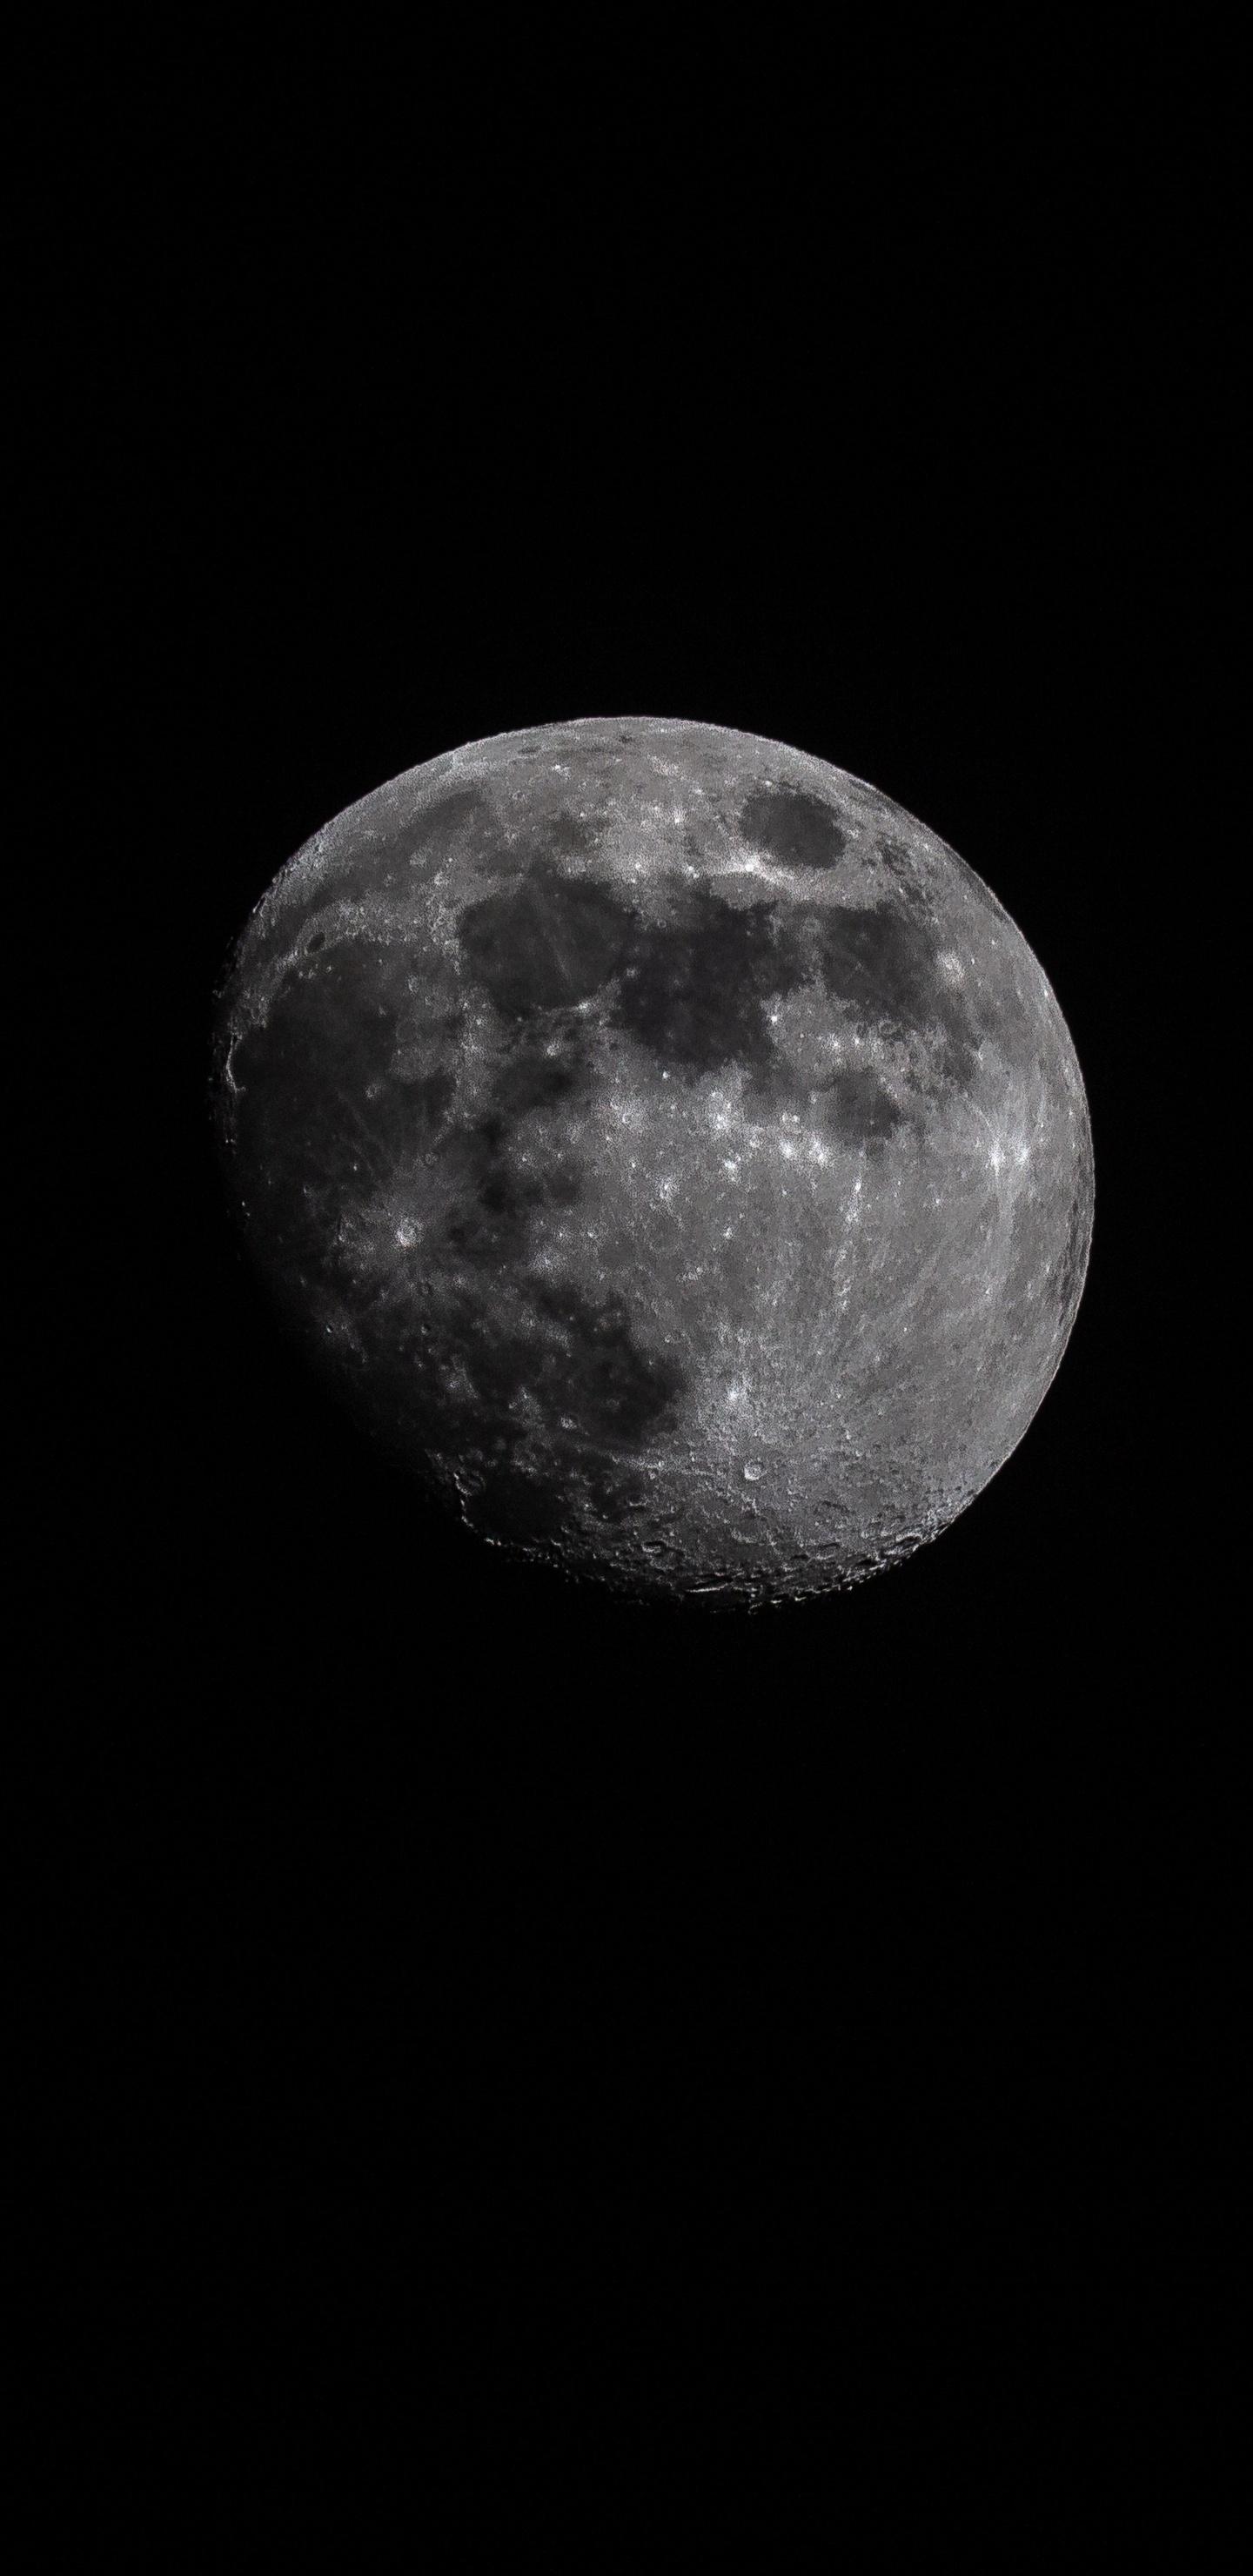 1440x2960 Moon Astrophotography Samsung Galaxy S8 S8 Note 8 QHD HD